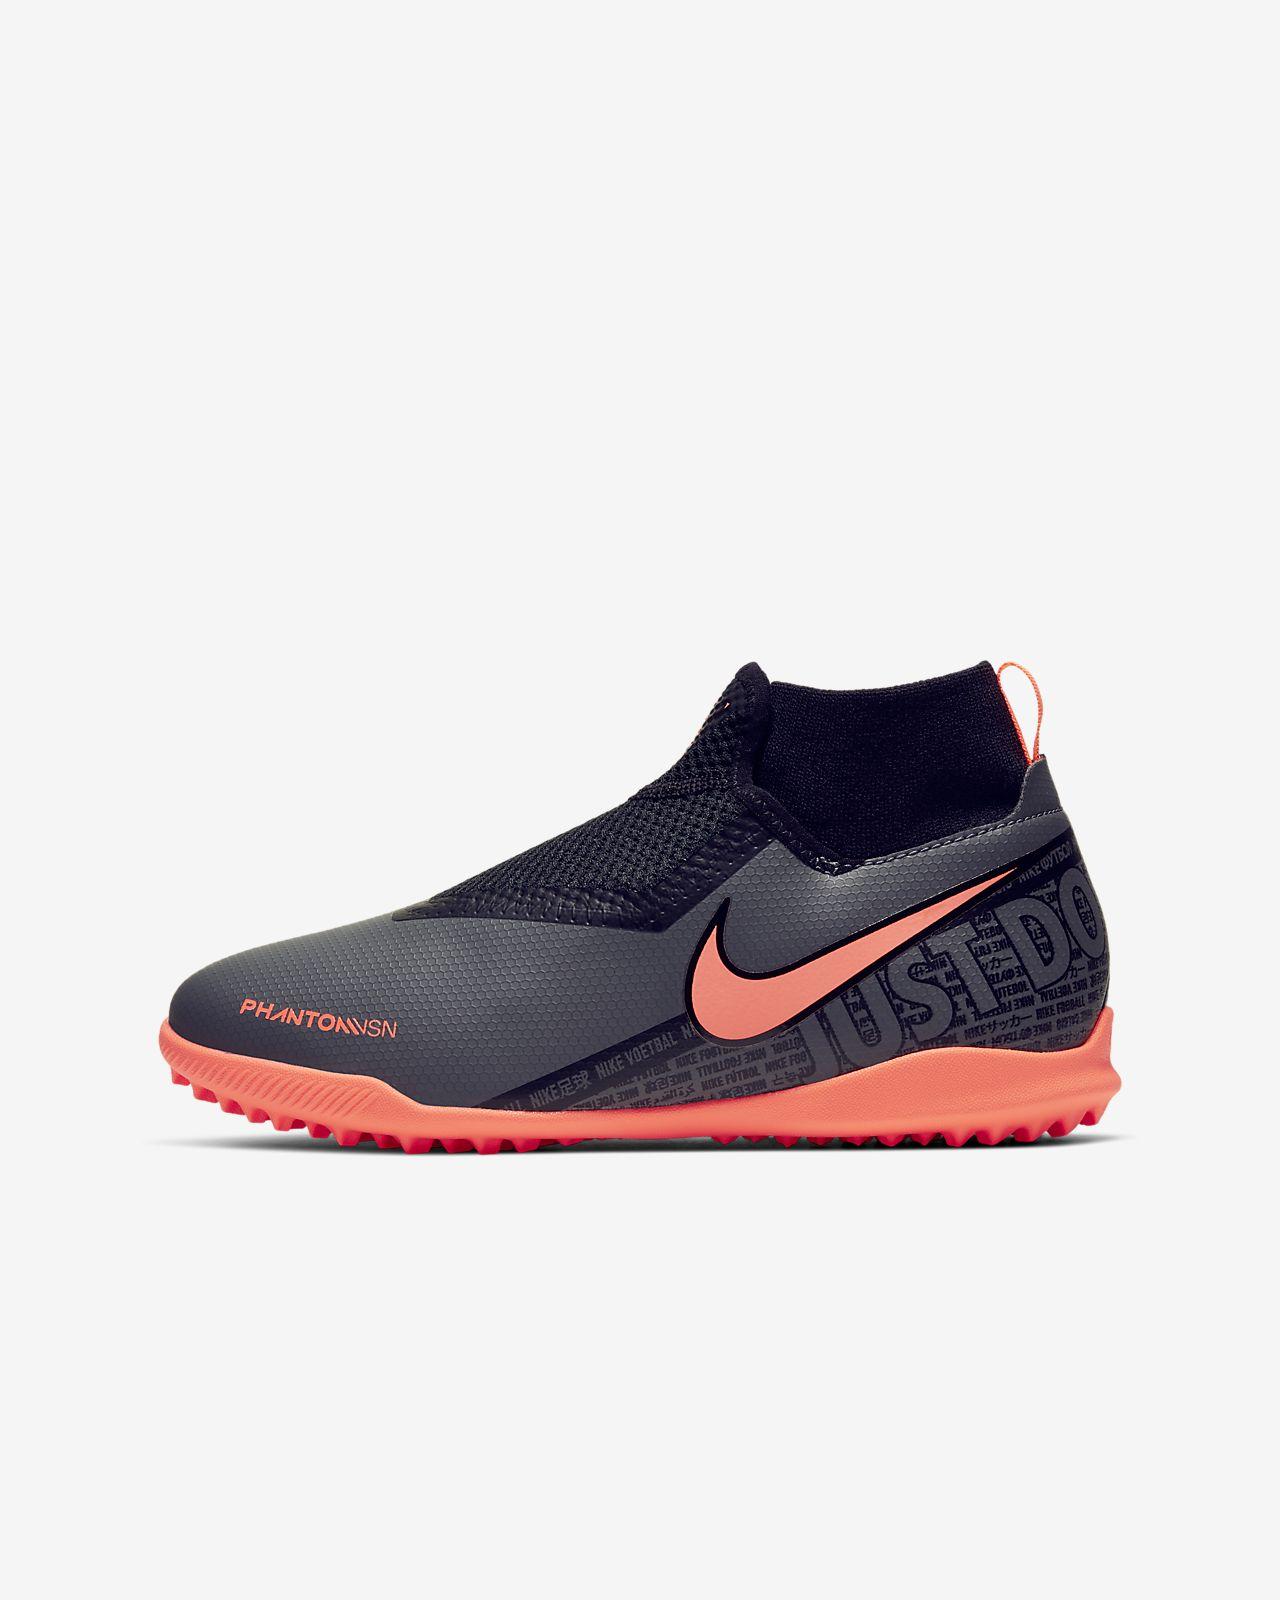 Nike Jr. Phantom Vision Academy Dynamic Fit Younger/Older Kids' Turf Football Shoe